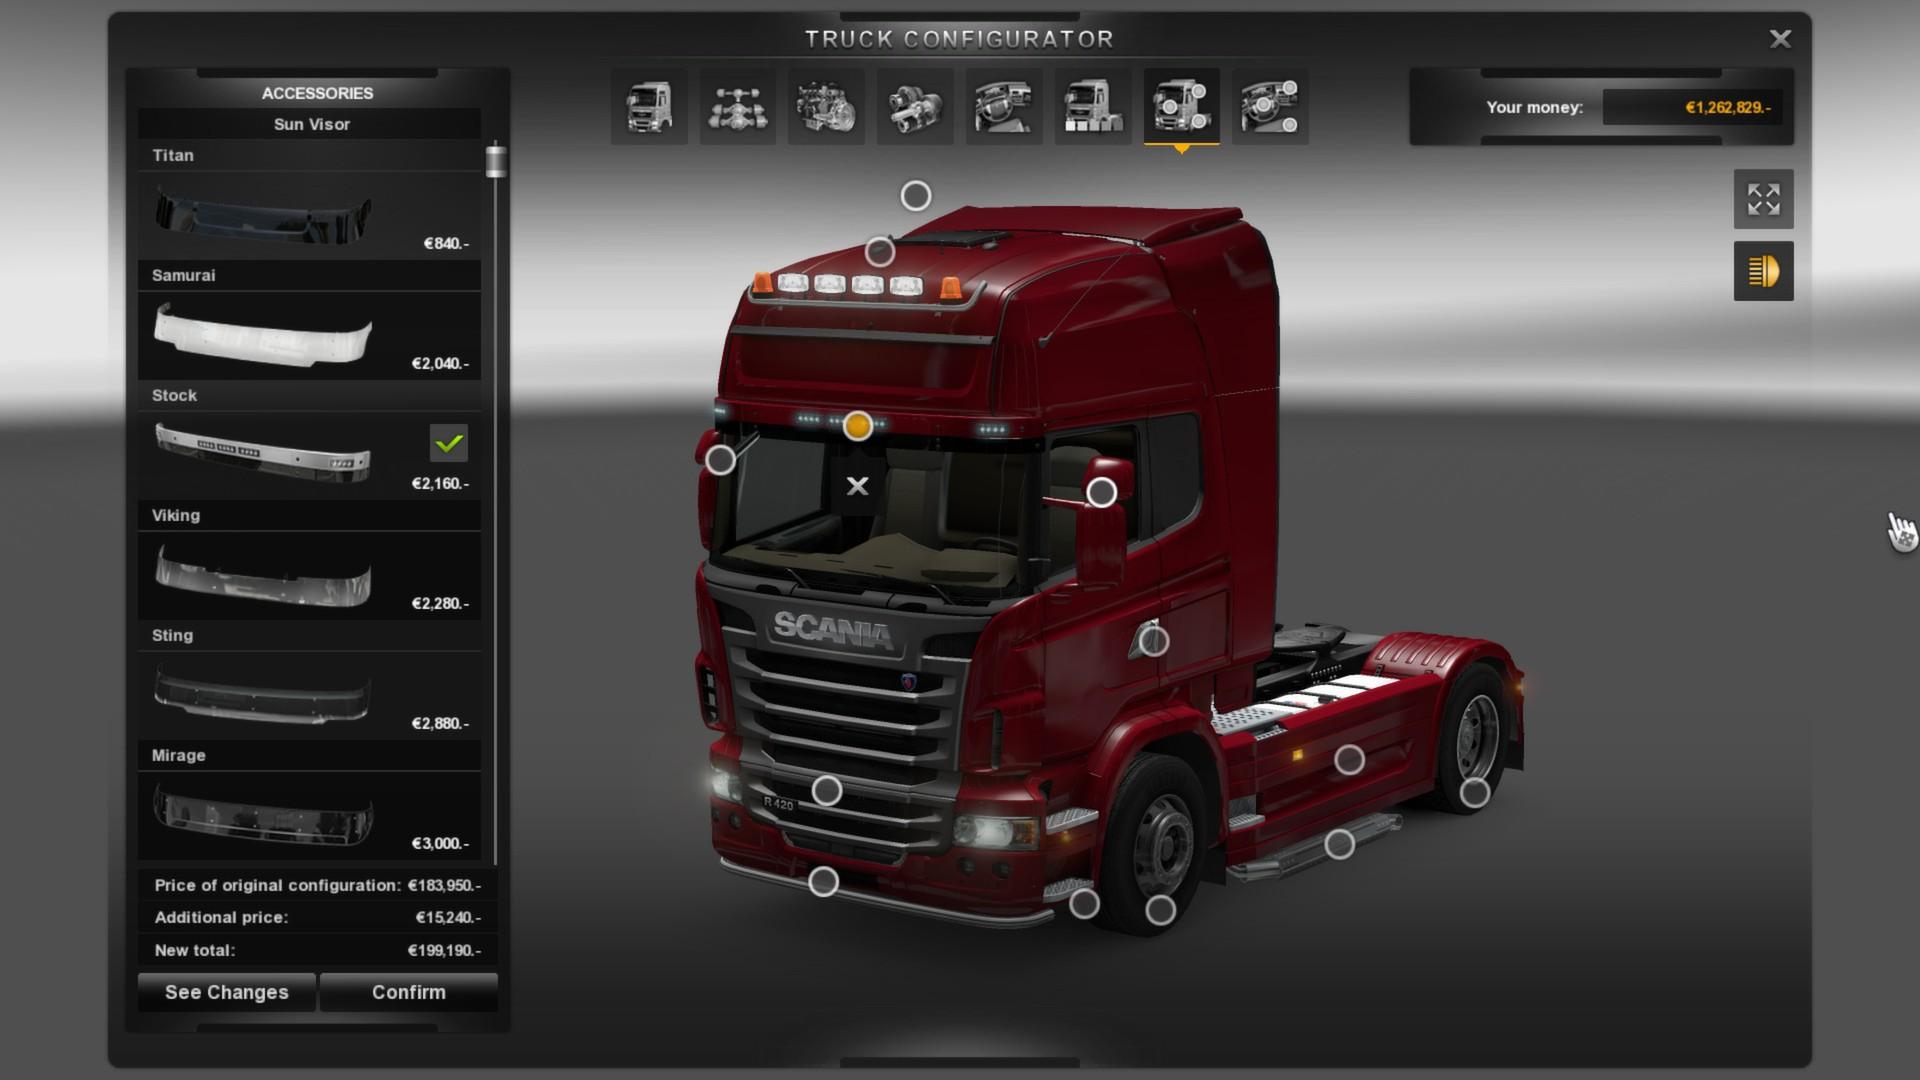 Euro Truck Simulator 2 Full List of Steam Top 100 Best Sellers of 2016